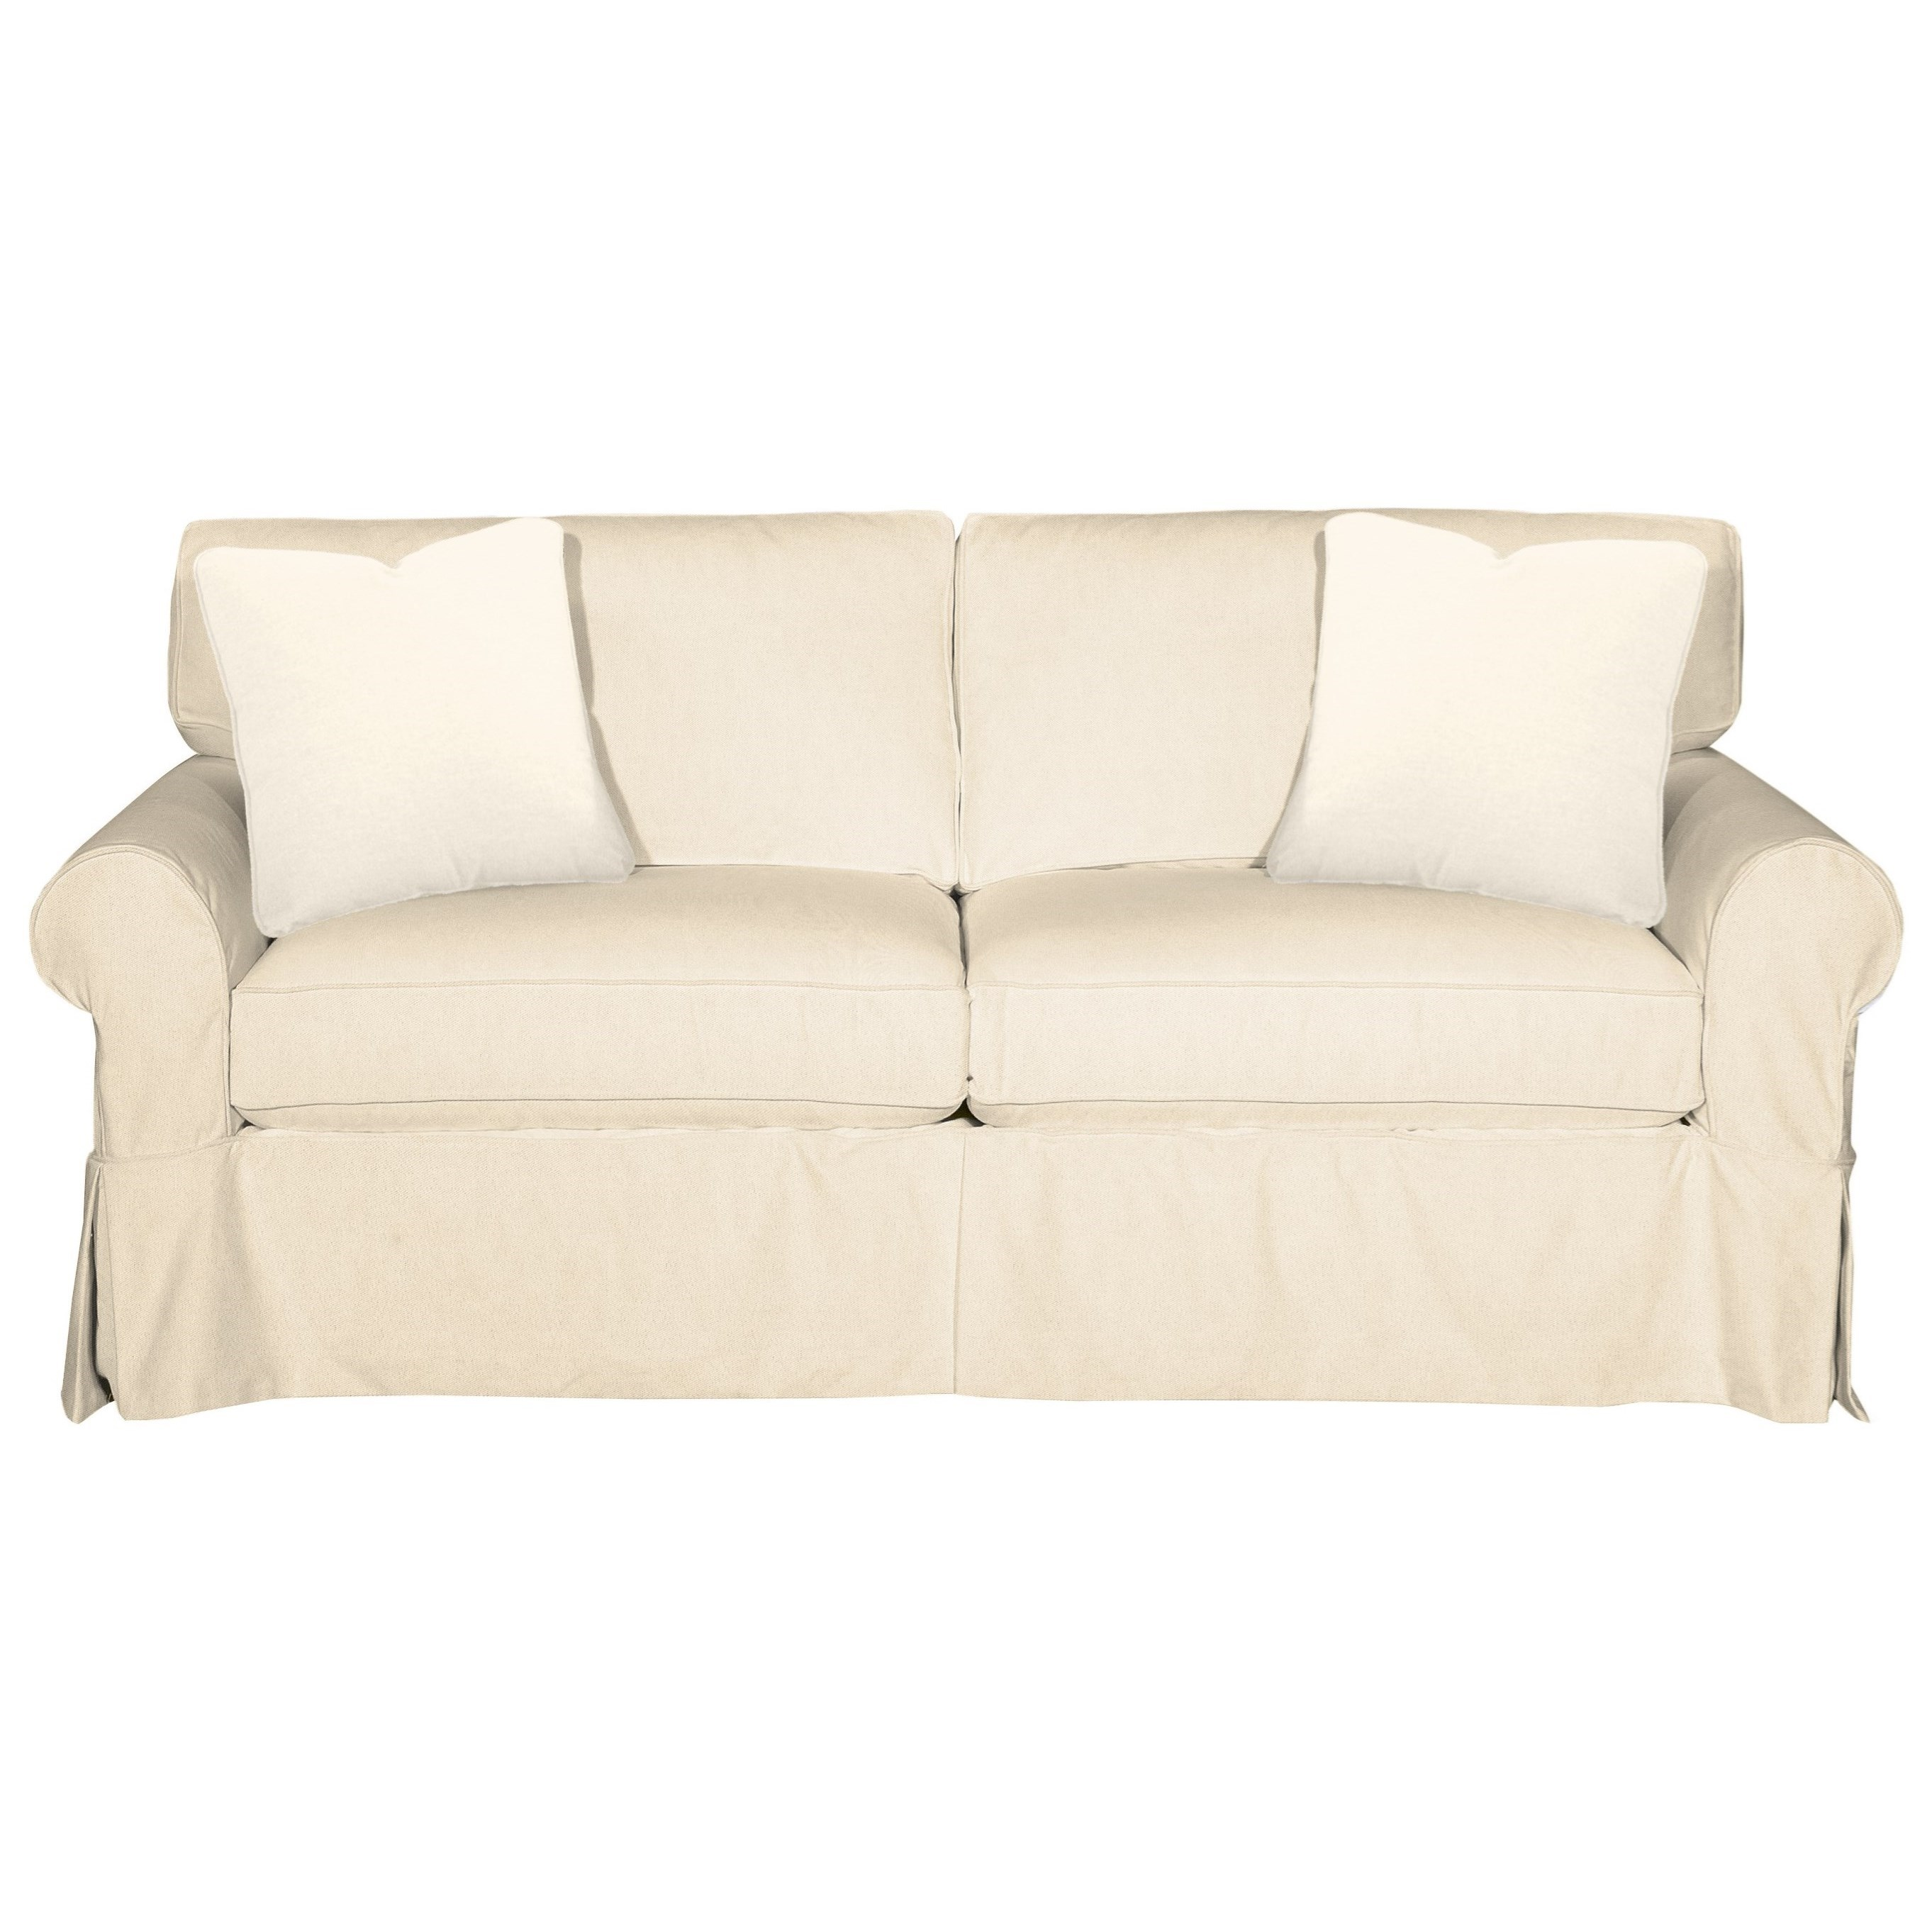 9228 Sleeper Sofa w/ Innerspring Mattress by Hickorycraft at Johnny Janosik